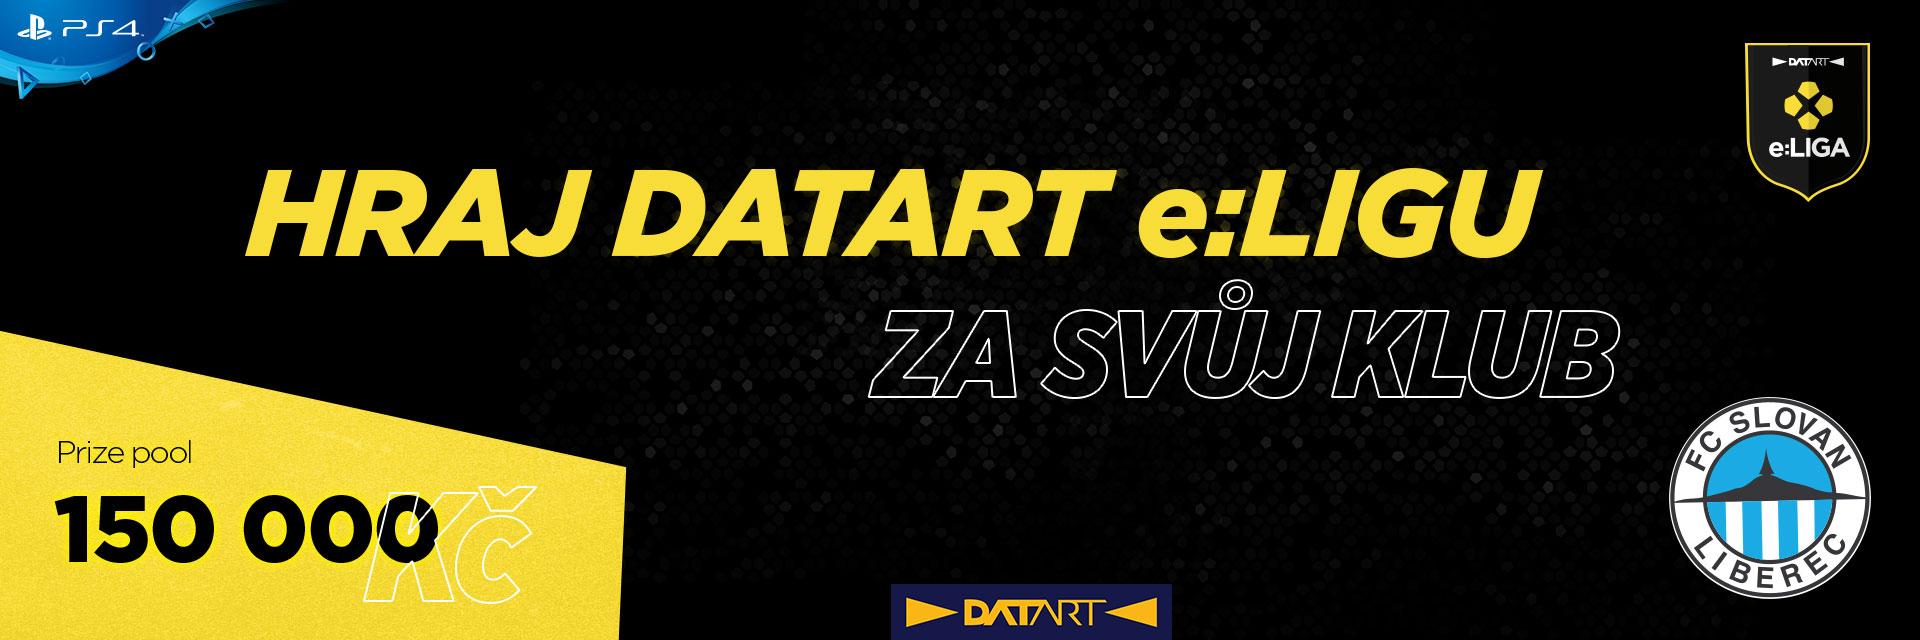 datart-e-liga-klubove-kolo-fc-slovan-liberec-1